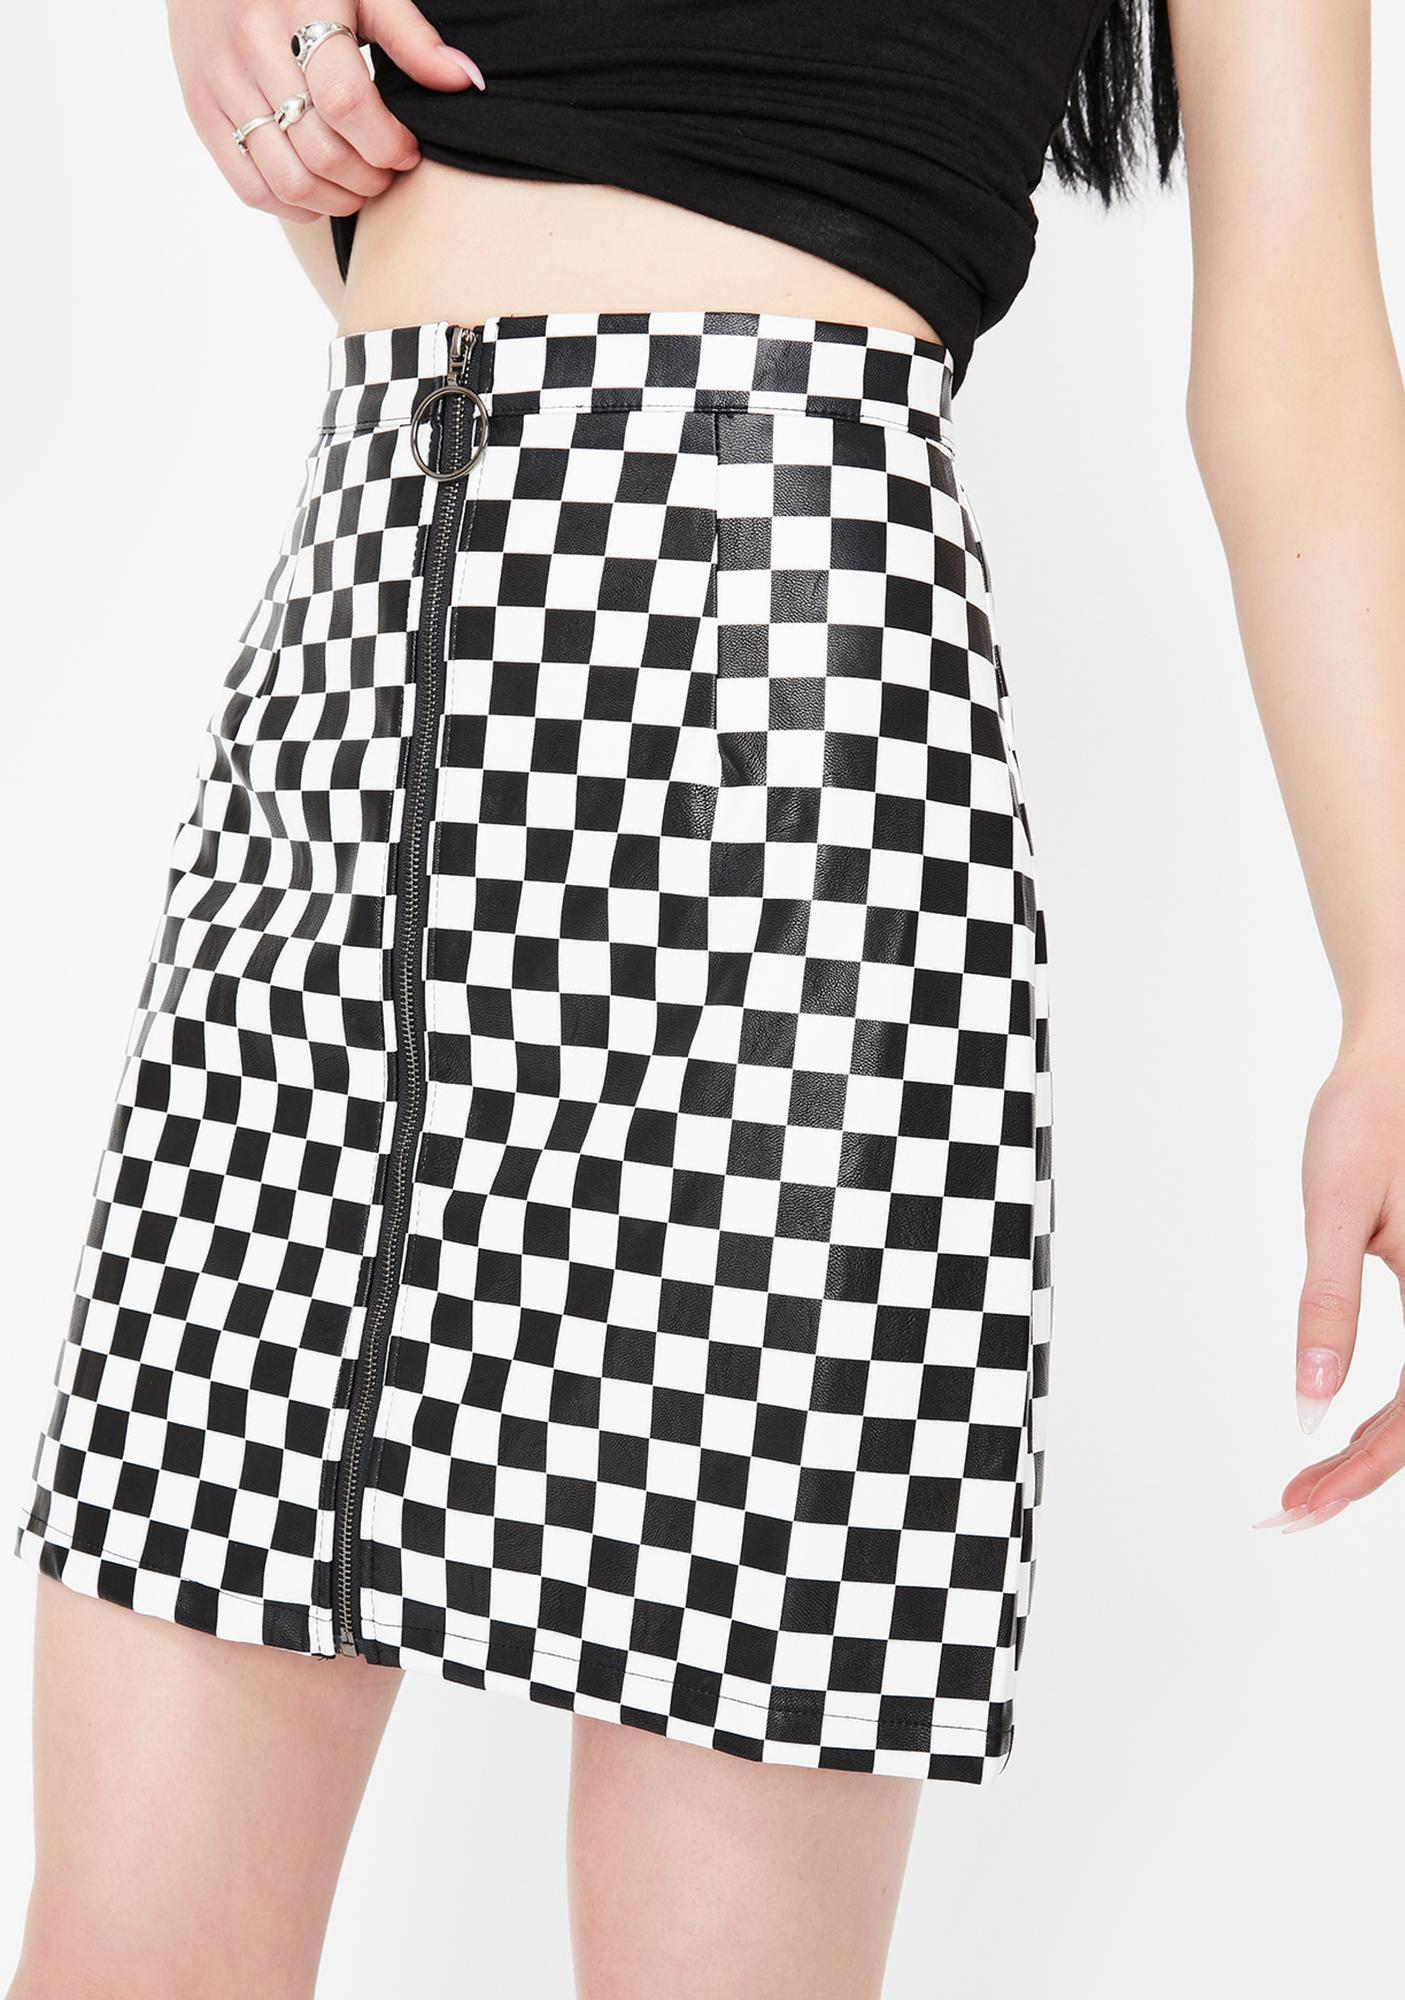 Daisy Street Checkered Vinyl A-Line Mini Skirt